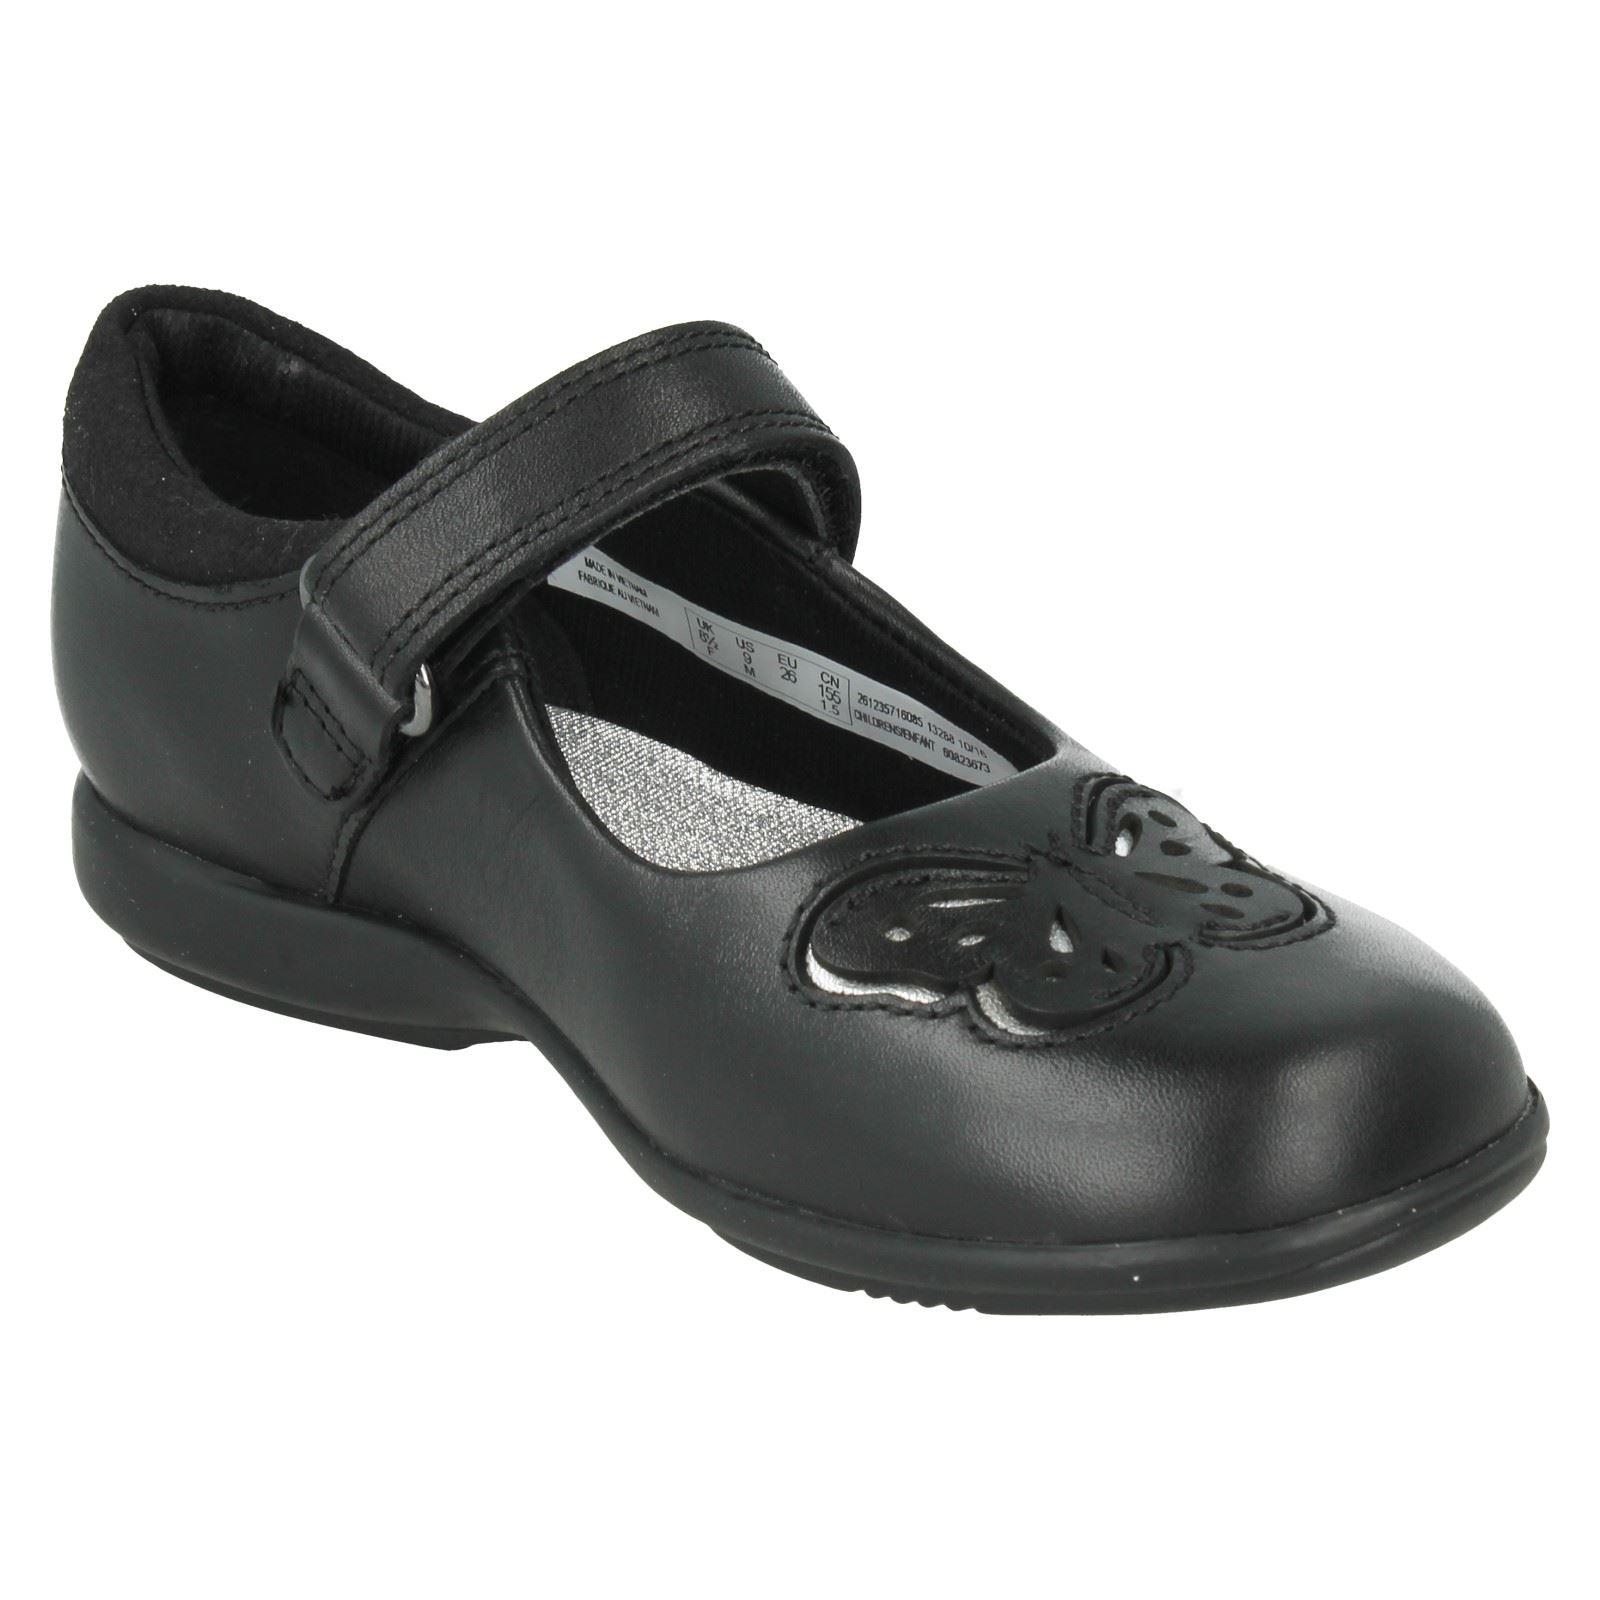 Chicas Clarks Zapatos Escolares Trixi Rose